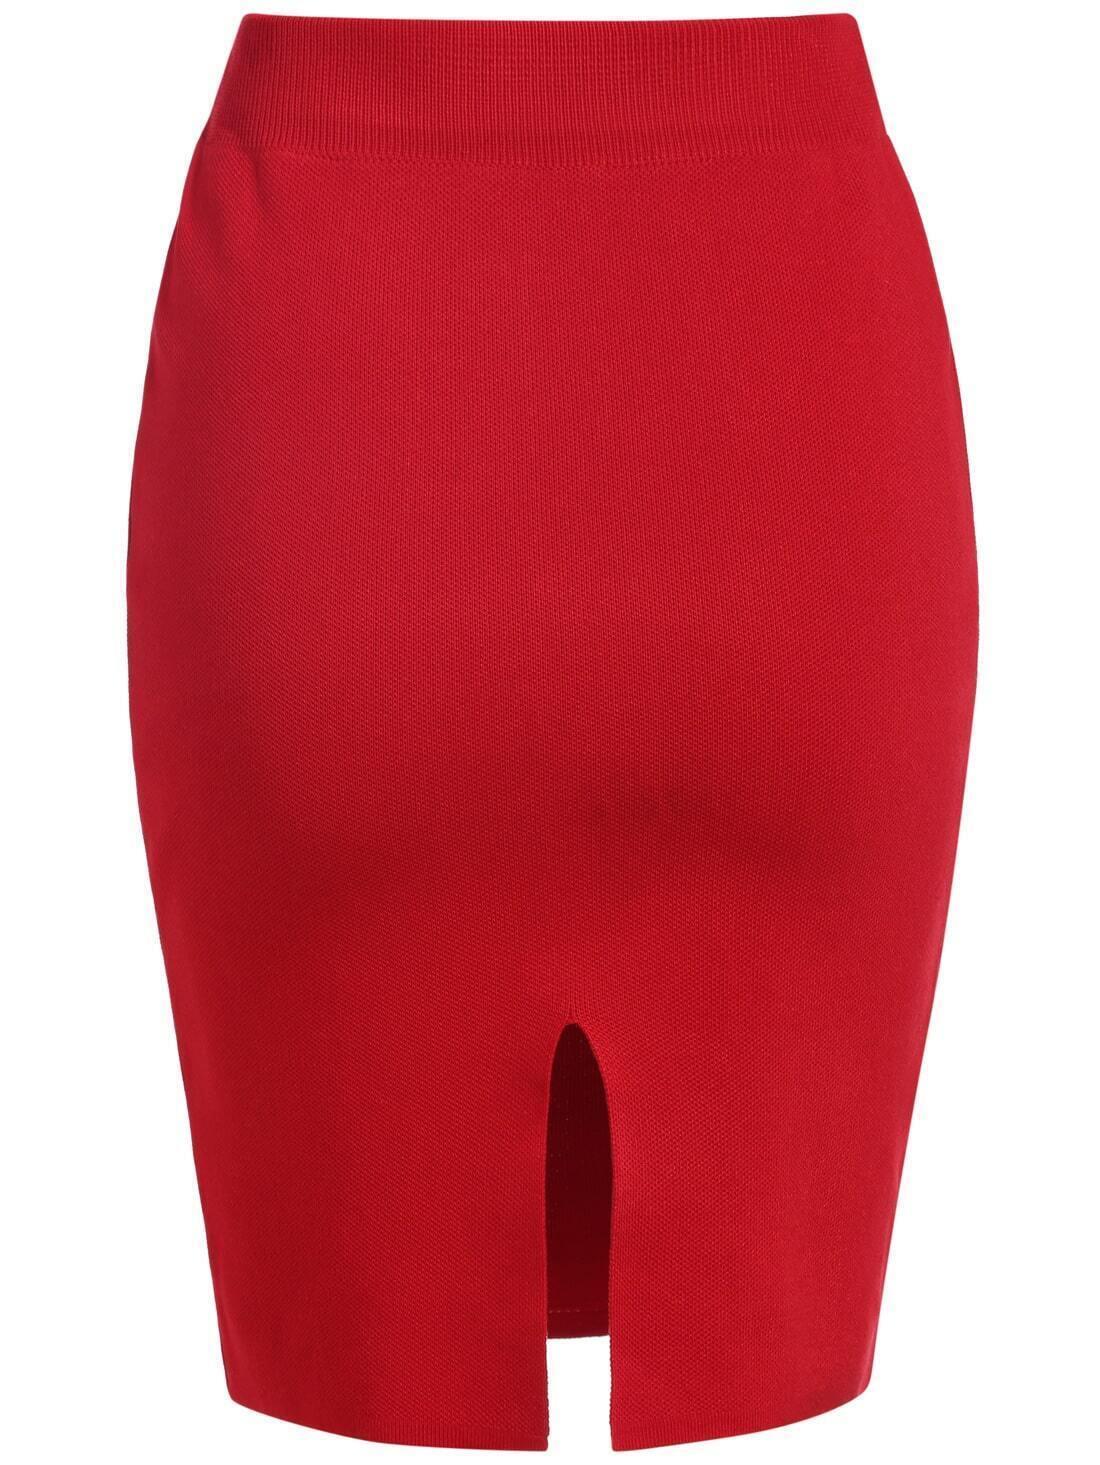 Falda cropped tubo rojo spanish romwe sitio m vil for Tubo corrugado rojo precio